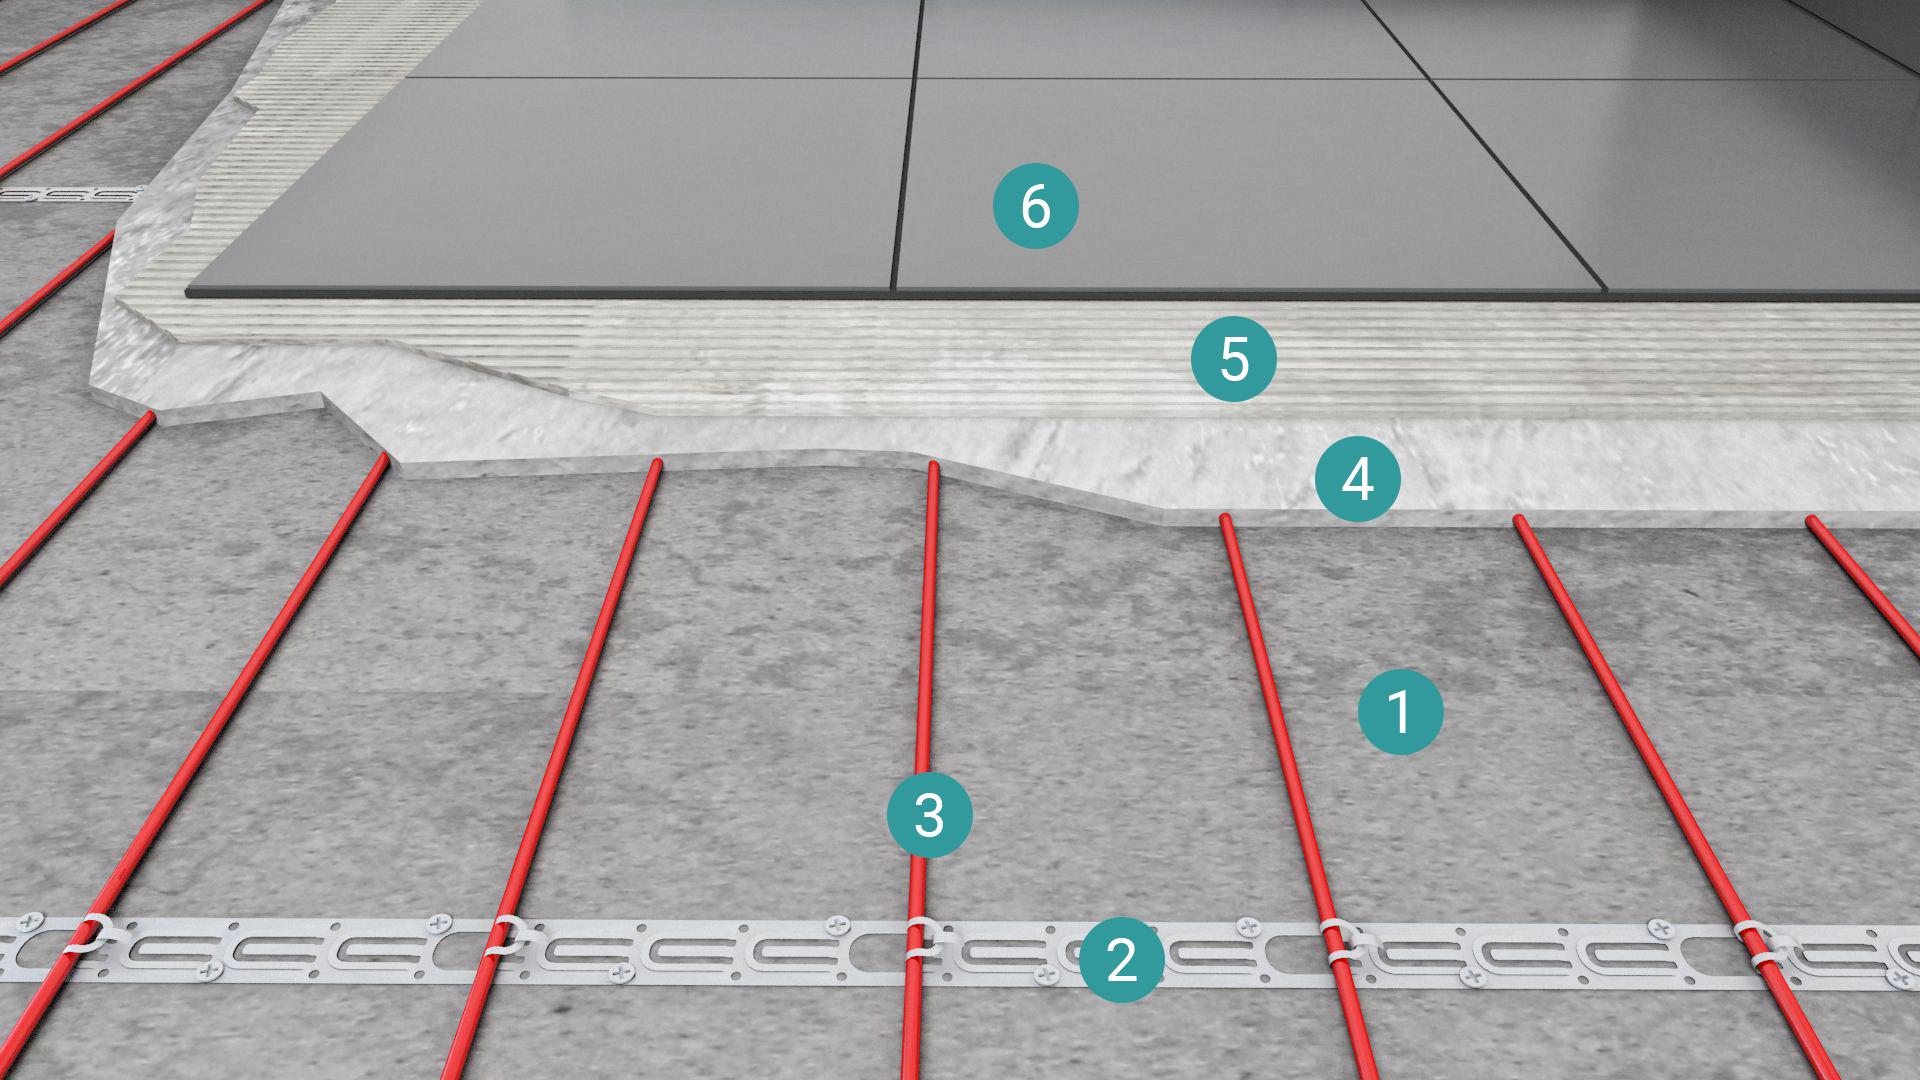 elektricke-podlahove-kurenie--vrstvy-skladba-2